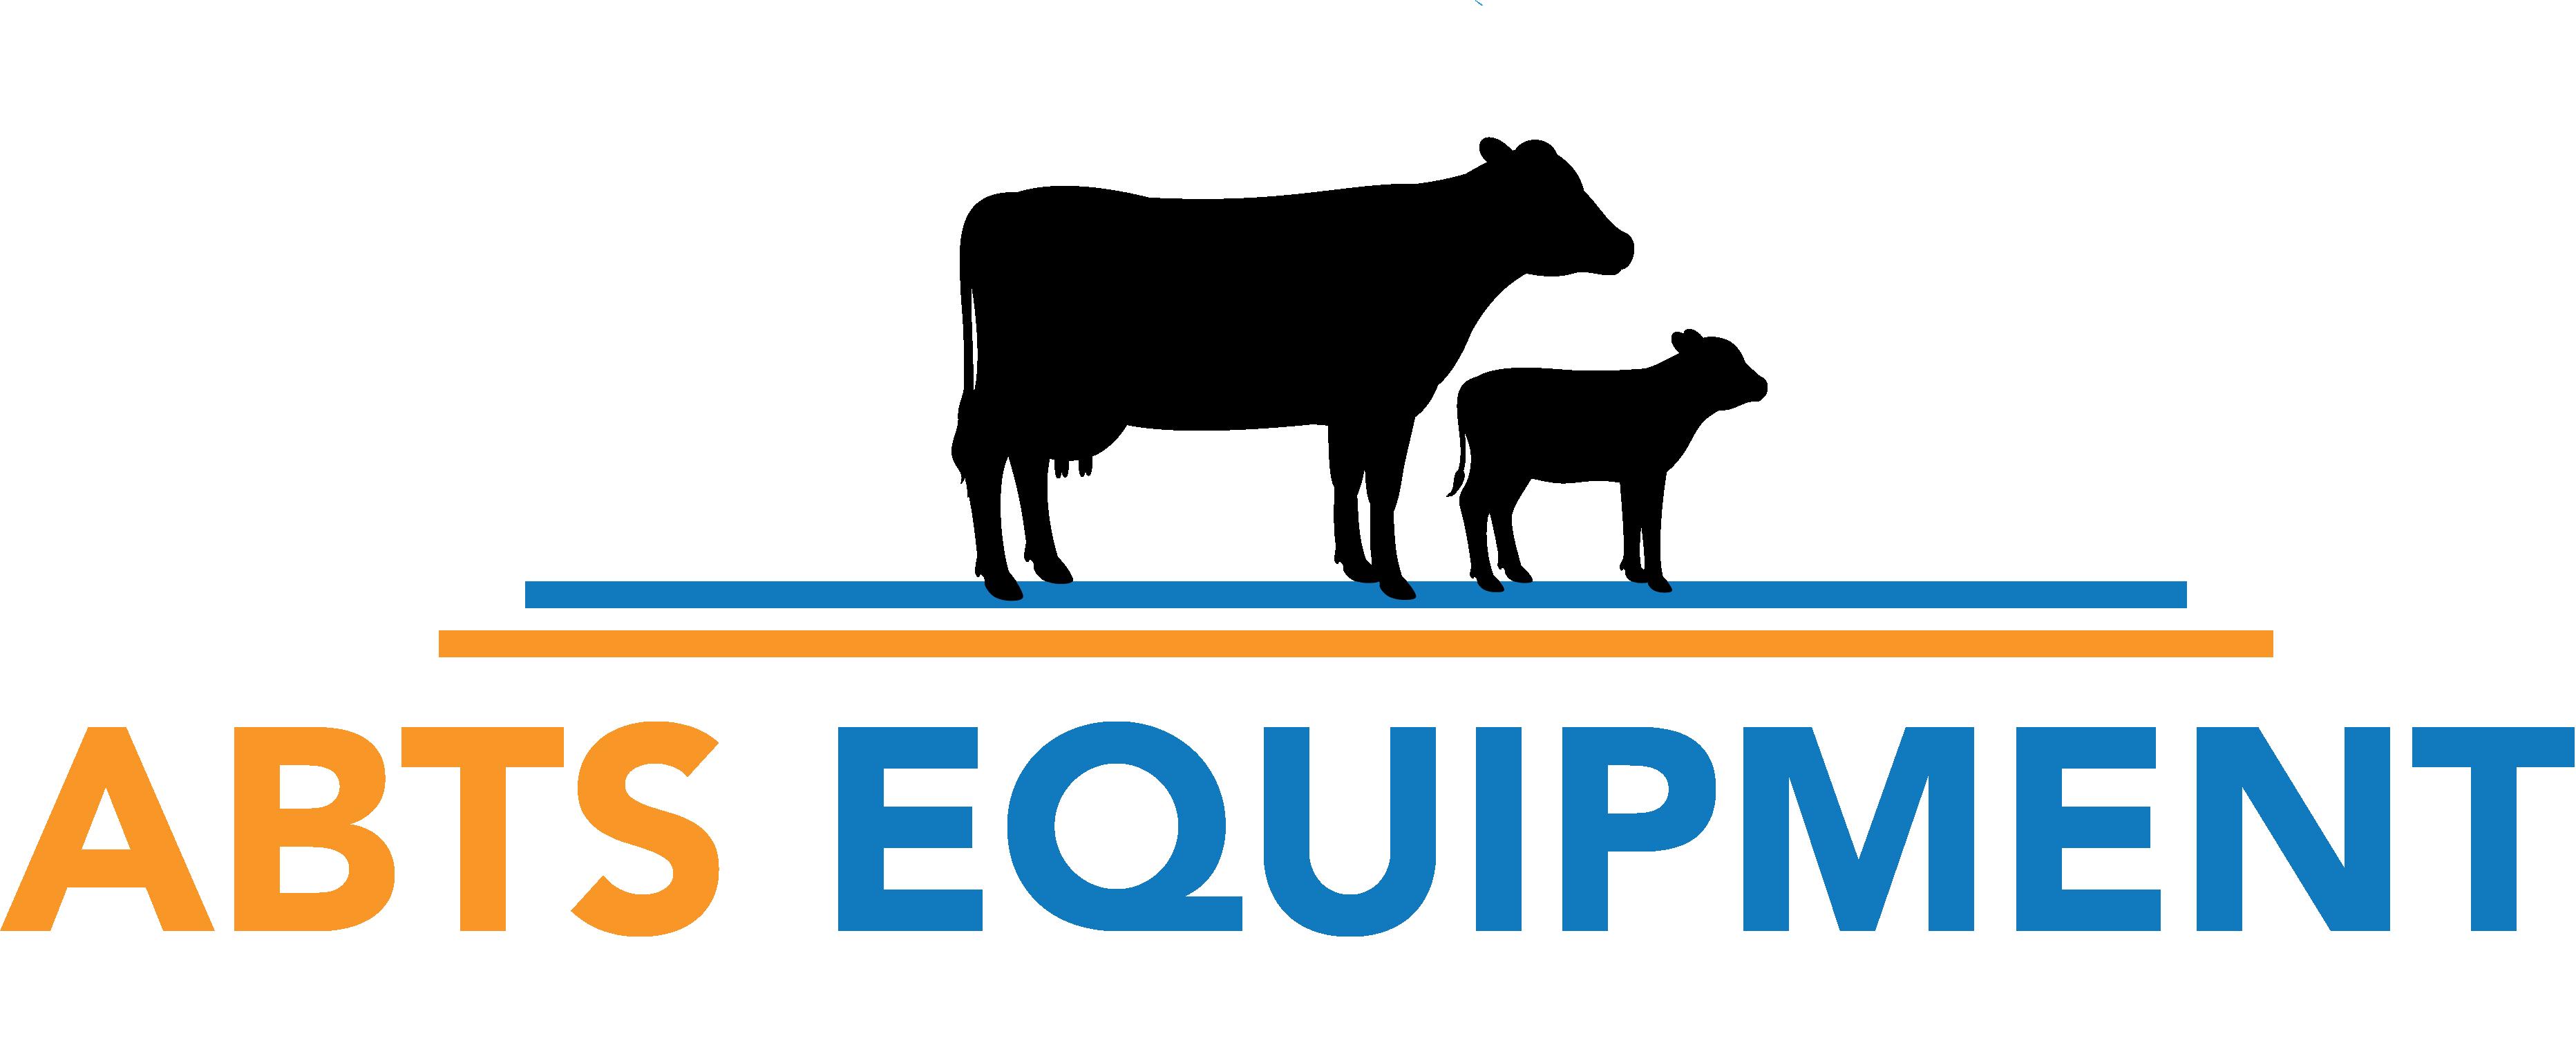 abts equipment logo